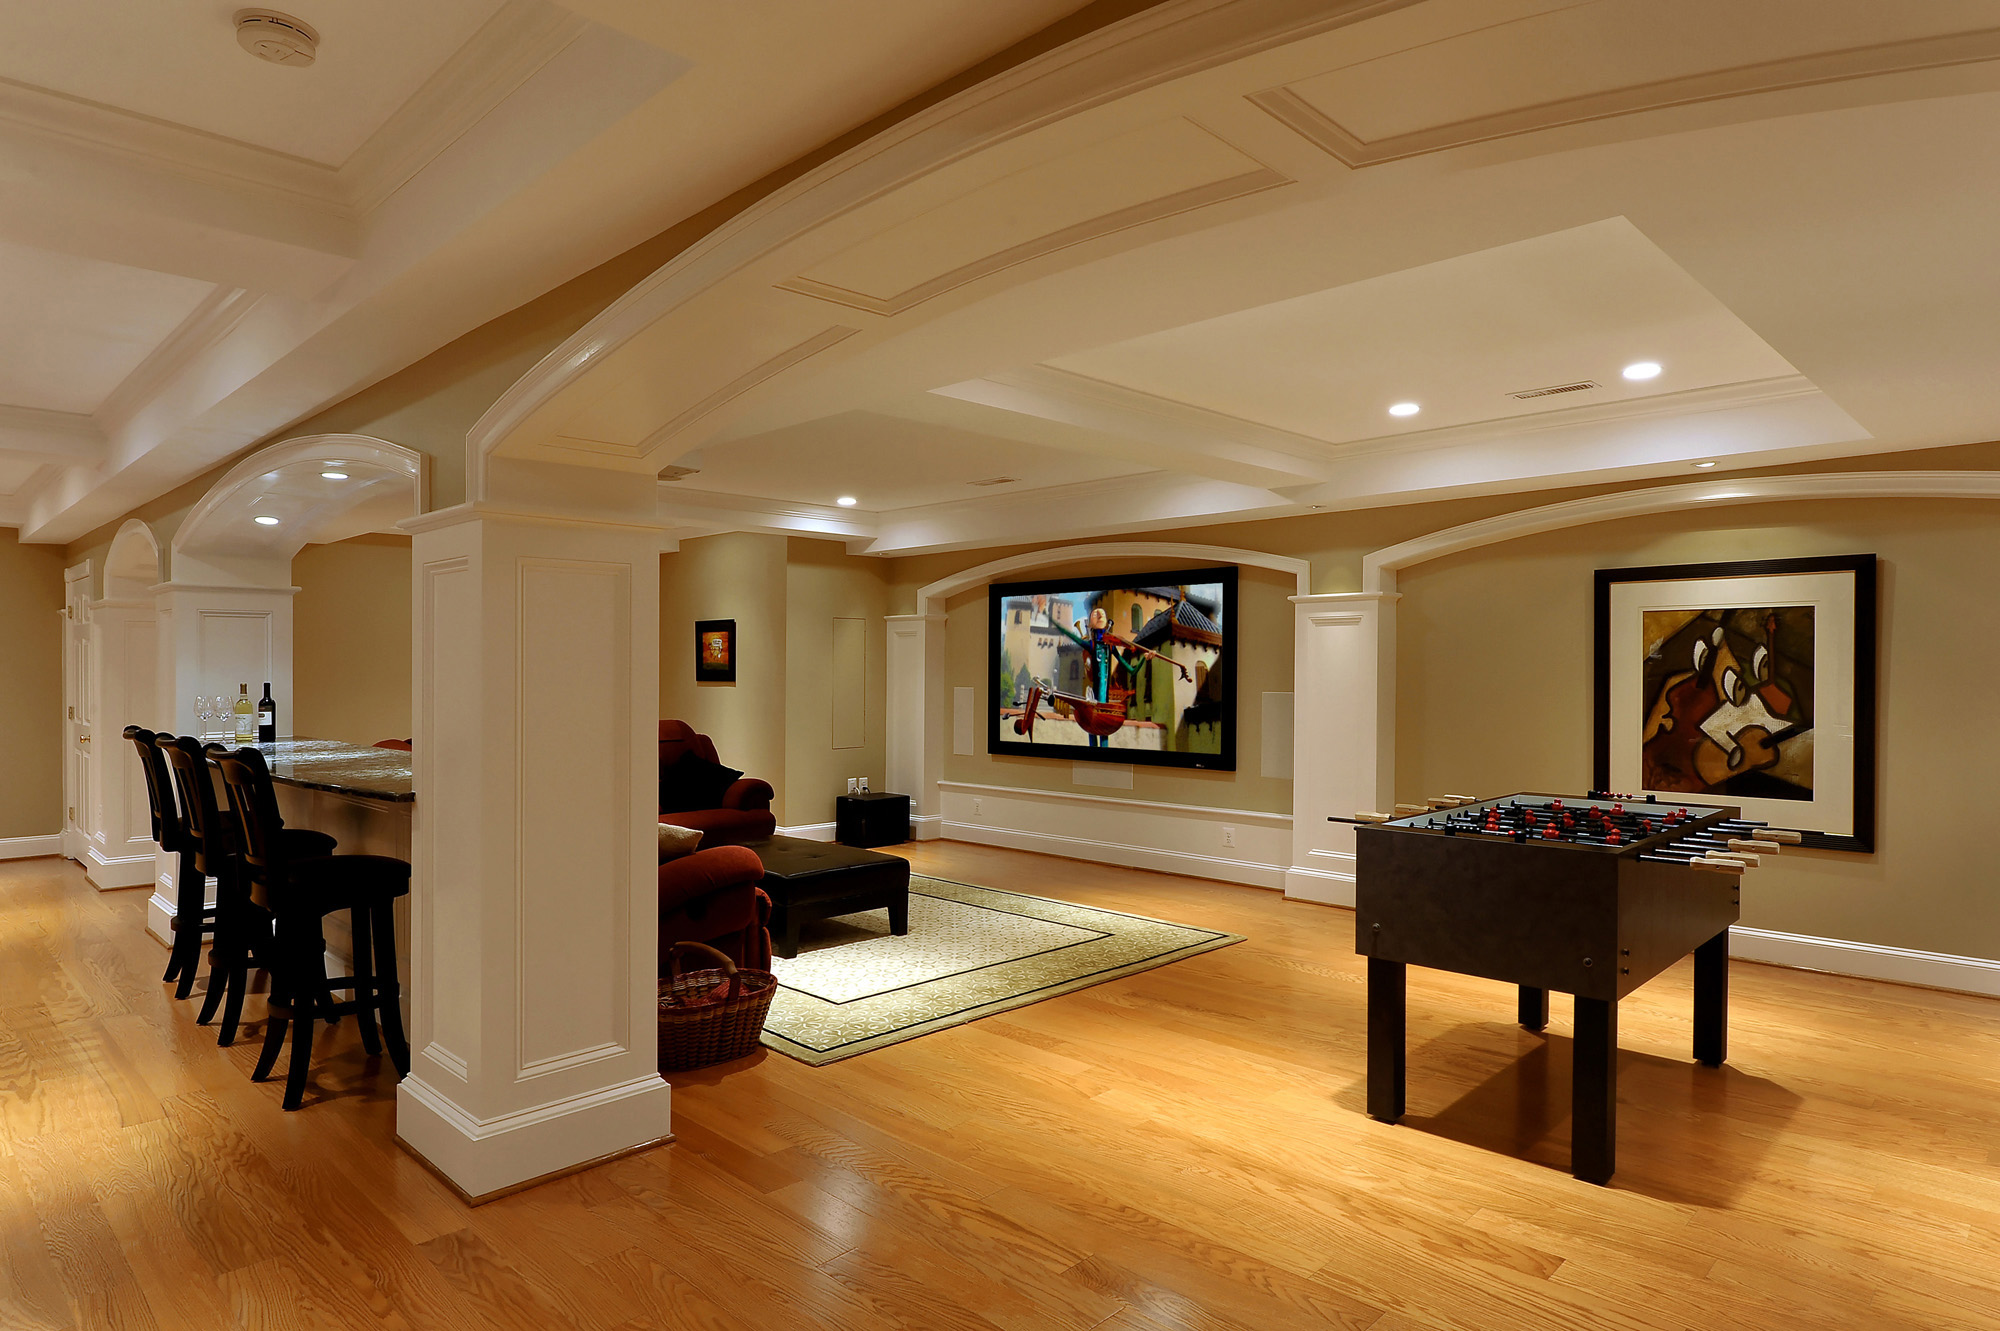 Basement Remodeling Boston Decor 100+  simple media room ideas  | home decor ideas magazine